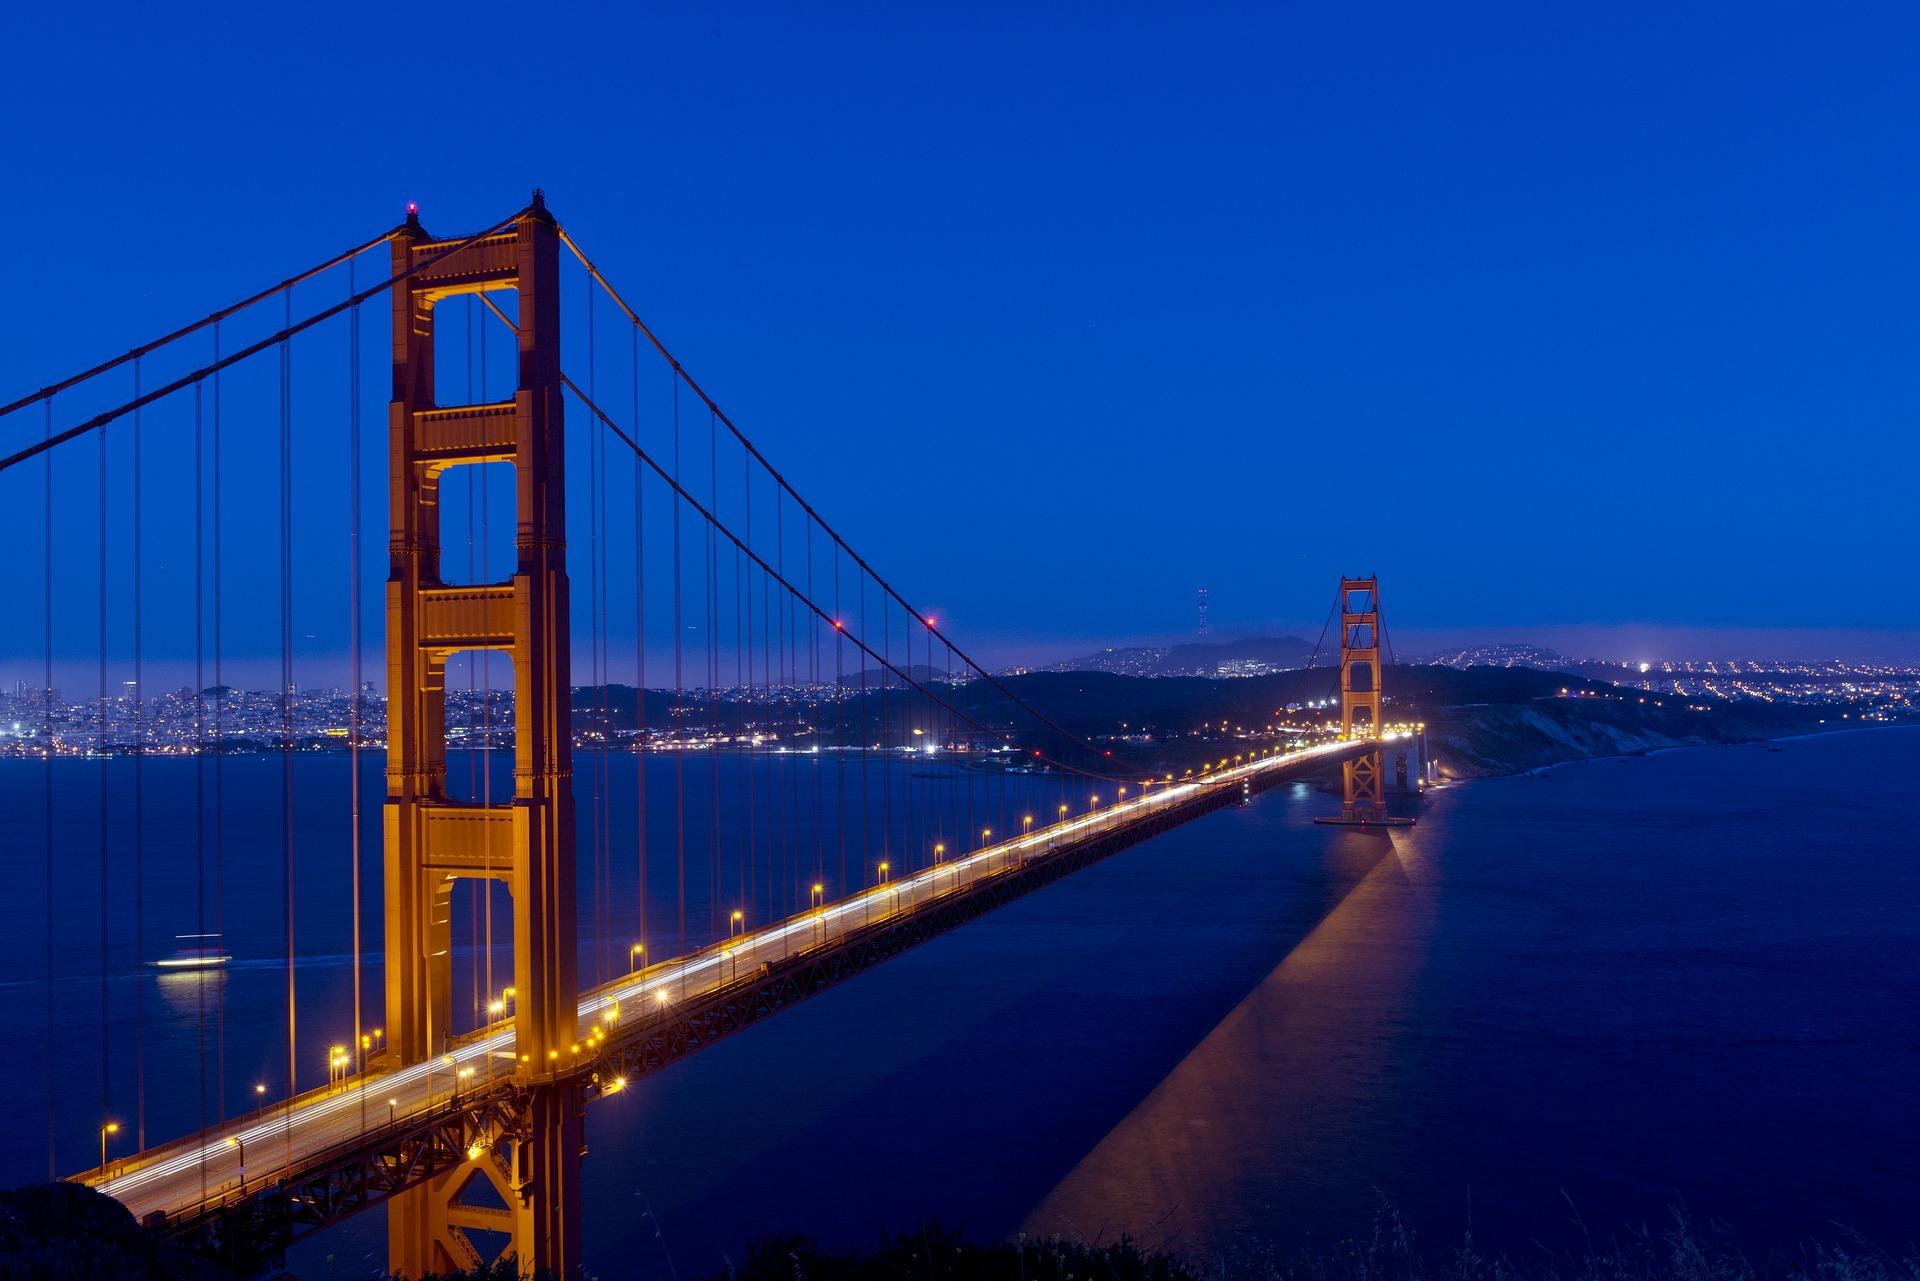 Golden Gate Bridge, America, American, Architecture, Bridge, HQ Photo